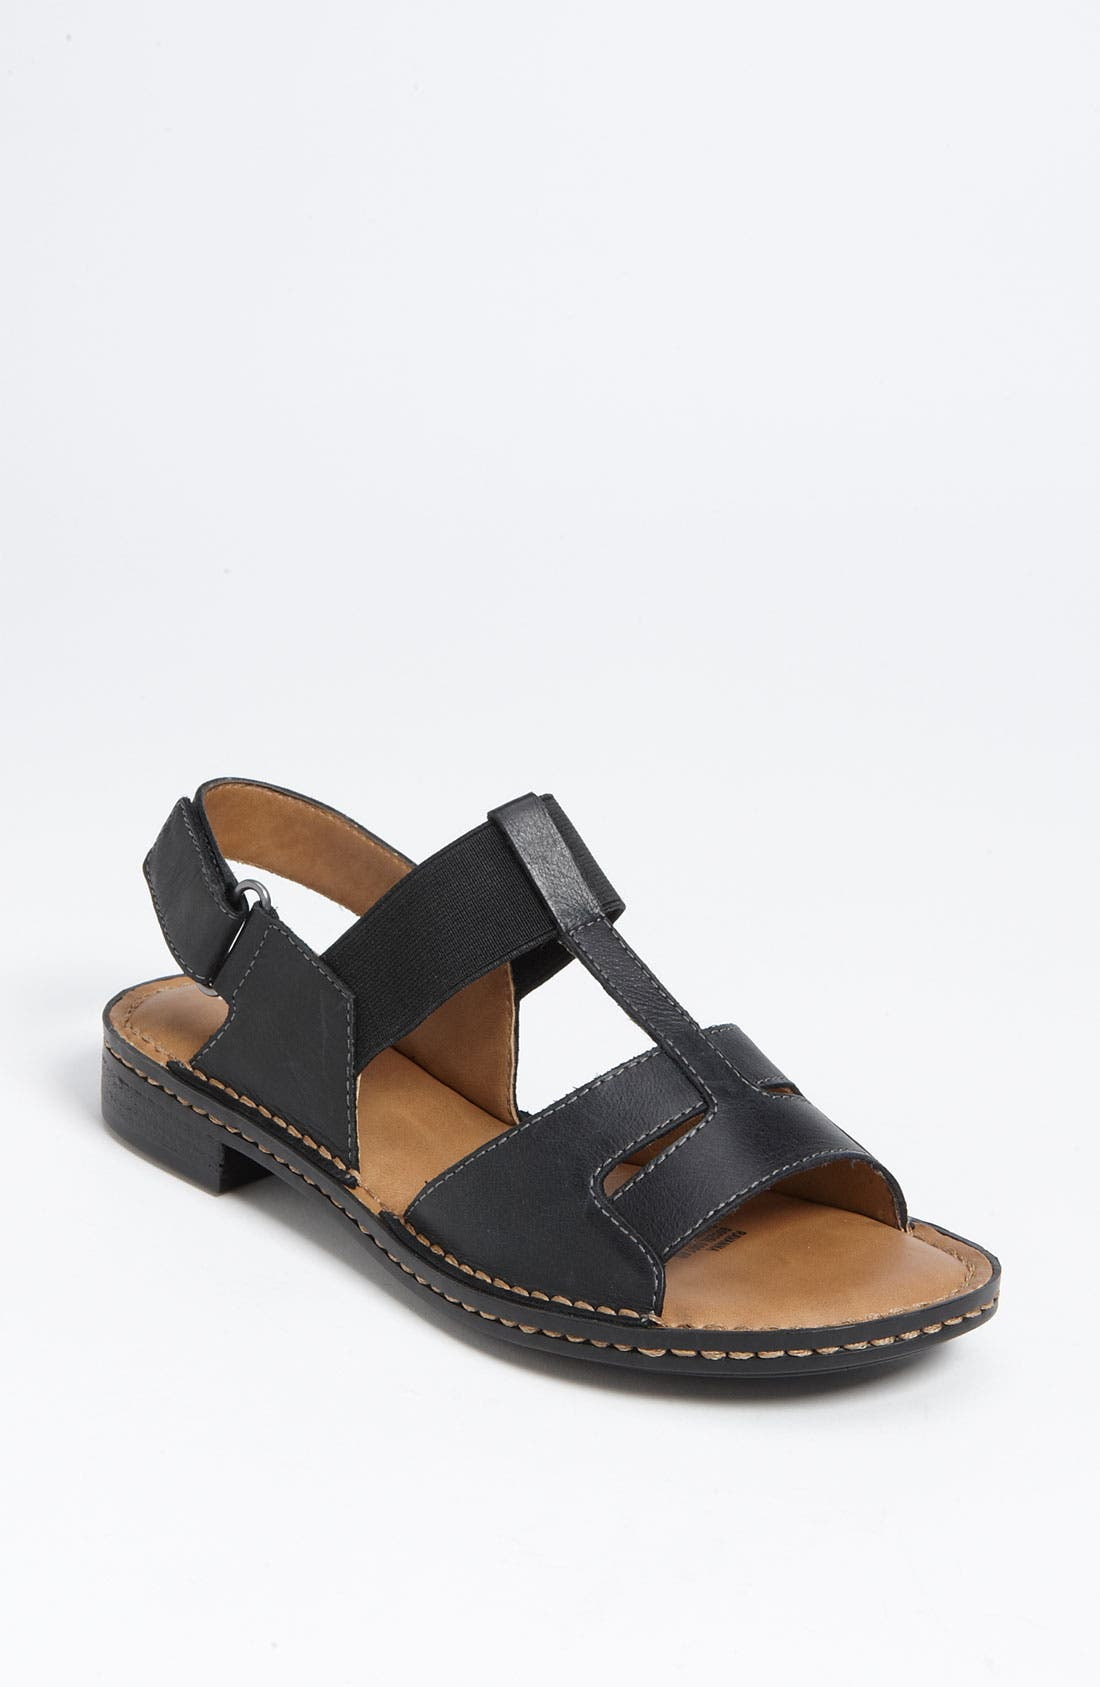 Alternate Image 1 Selected - Naturalizer 'Ravanna' Sandal